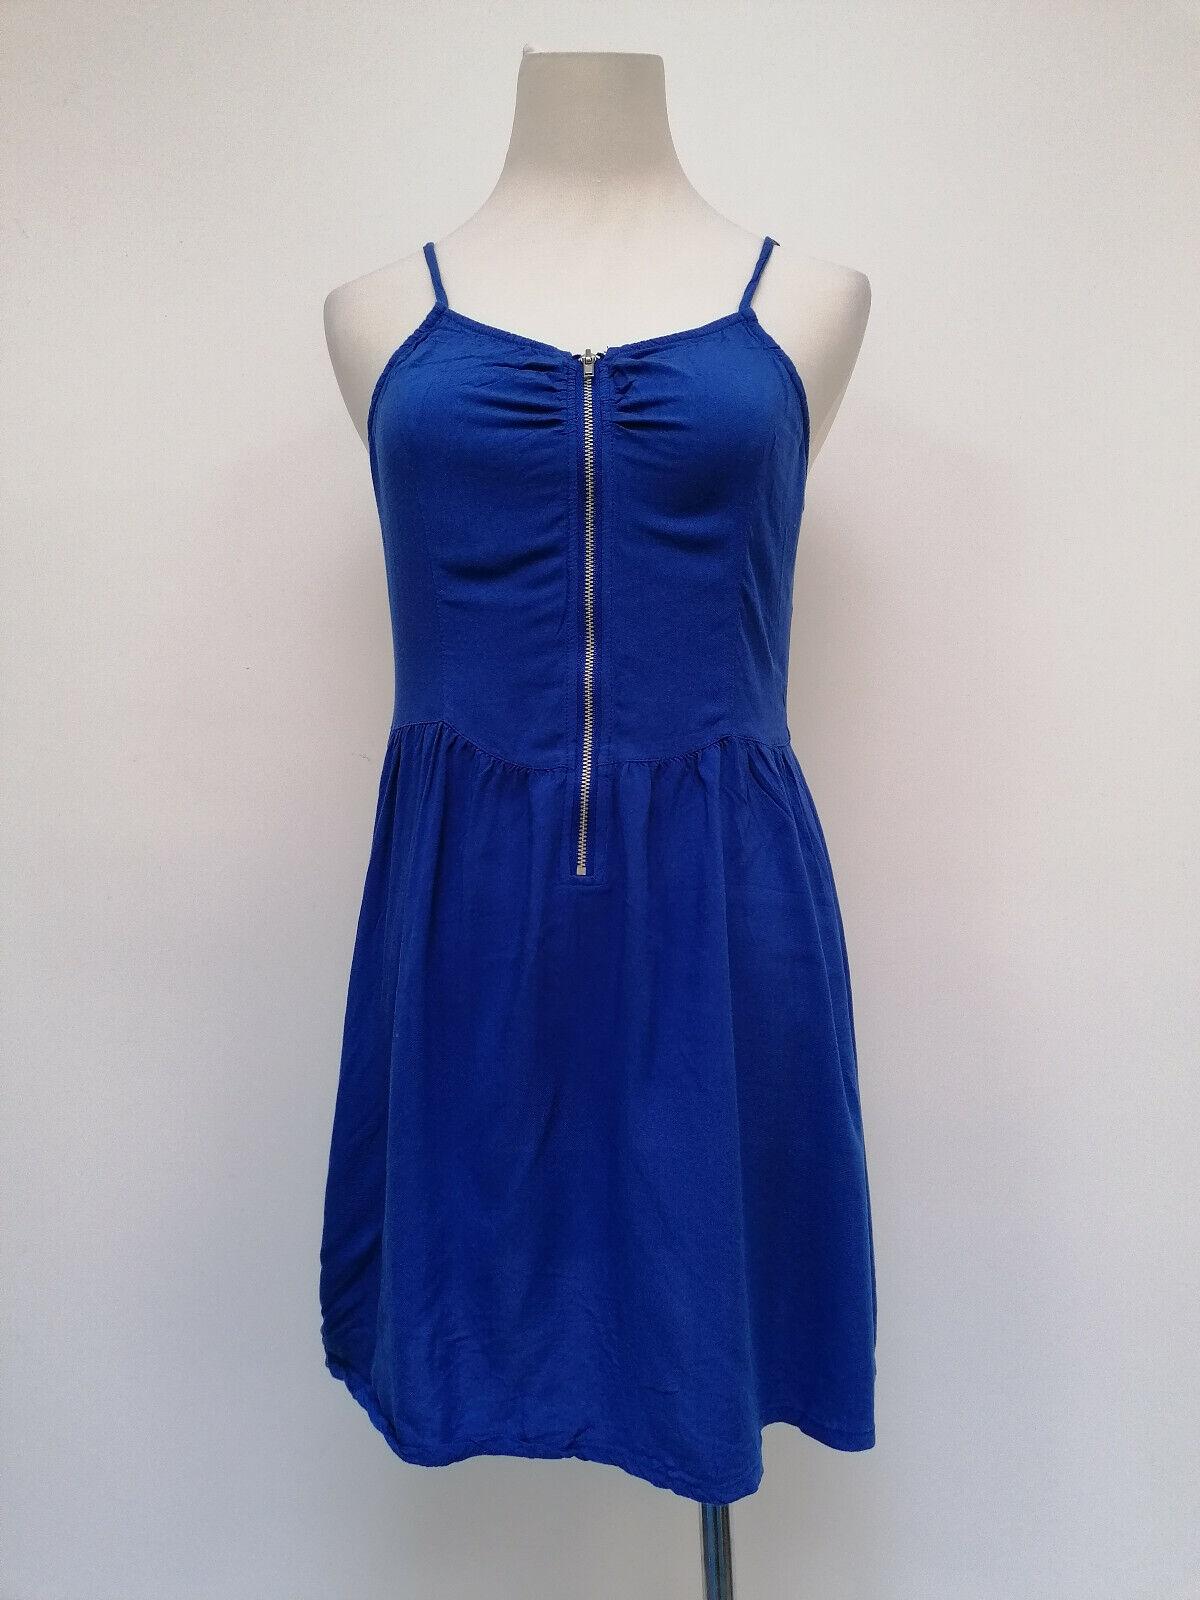 Divided Damen ärmellos Träger Kleid blau Größe 38 35325